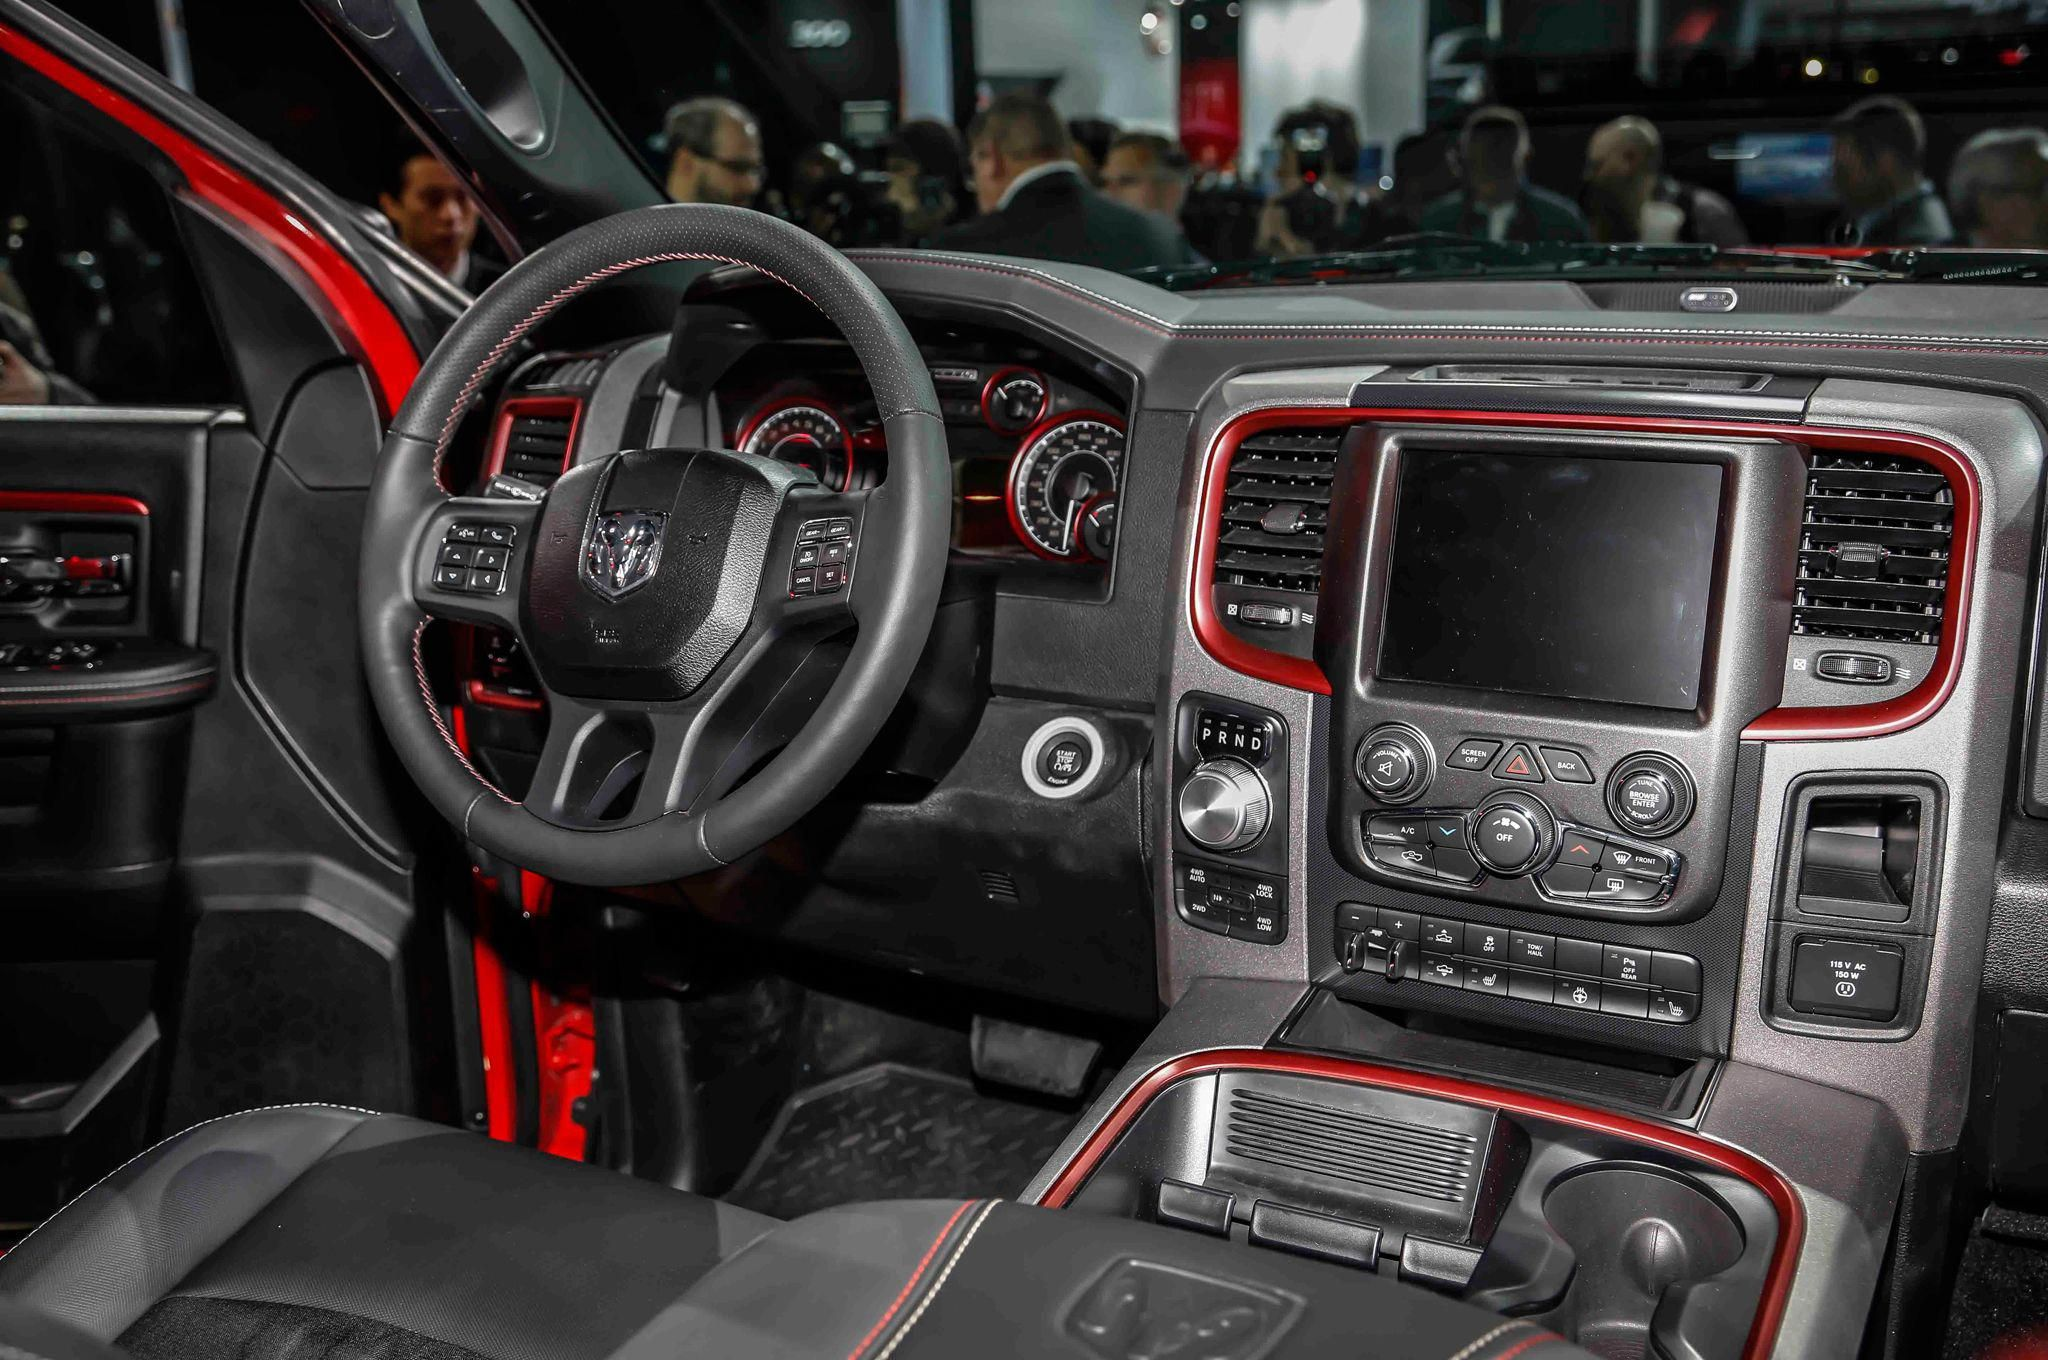 Home Guide Interior Design Interiorwallpaintideas Interiorwallideas Ram 1500 2017 Ram 1500 Dodge Trucks Ram